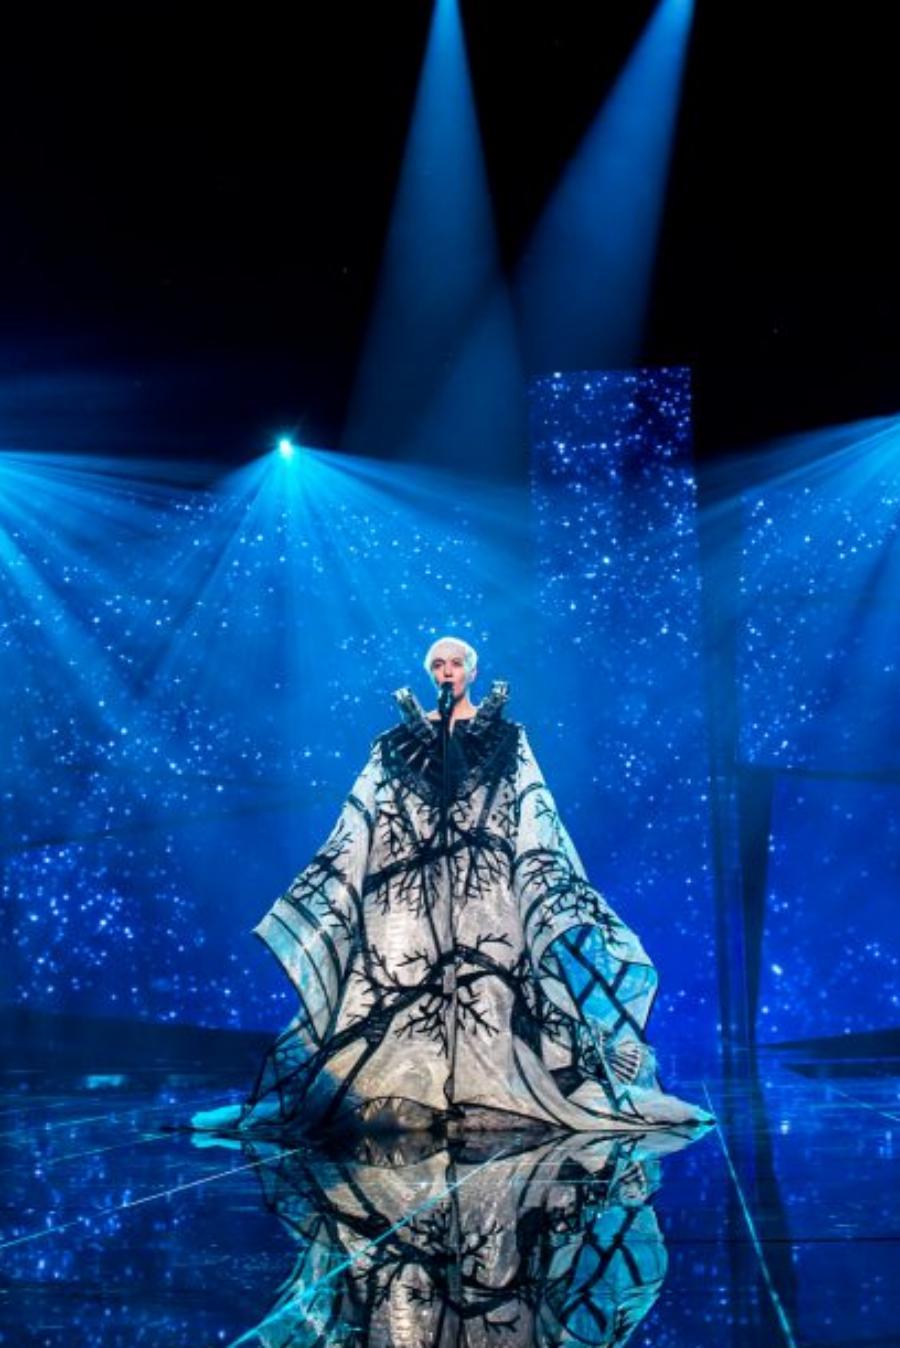 Eurovision Song Contest 2016: Croatia